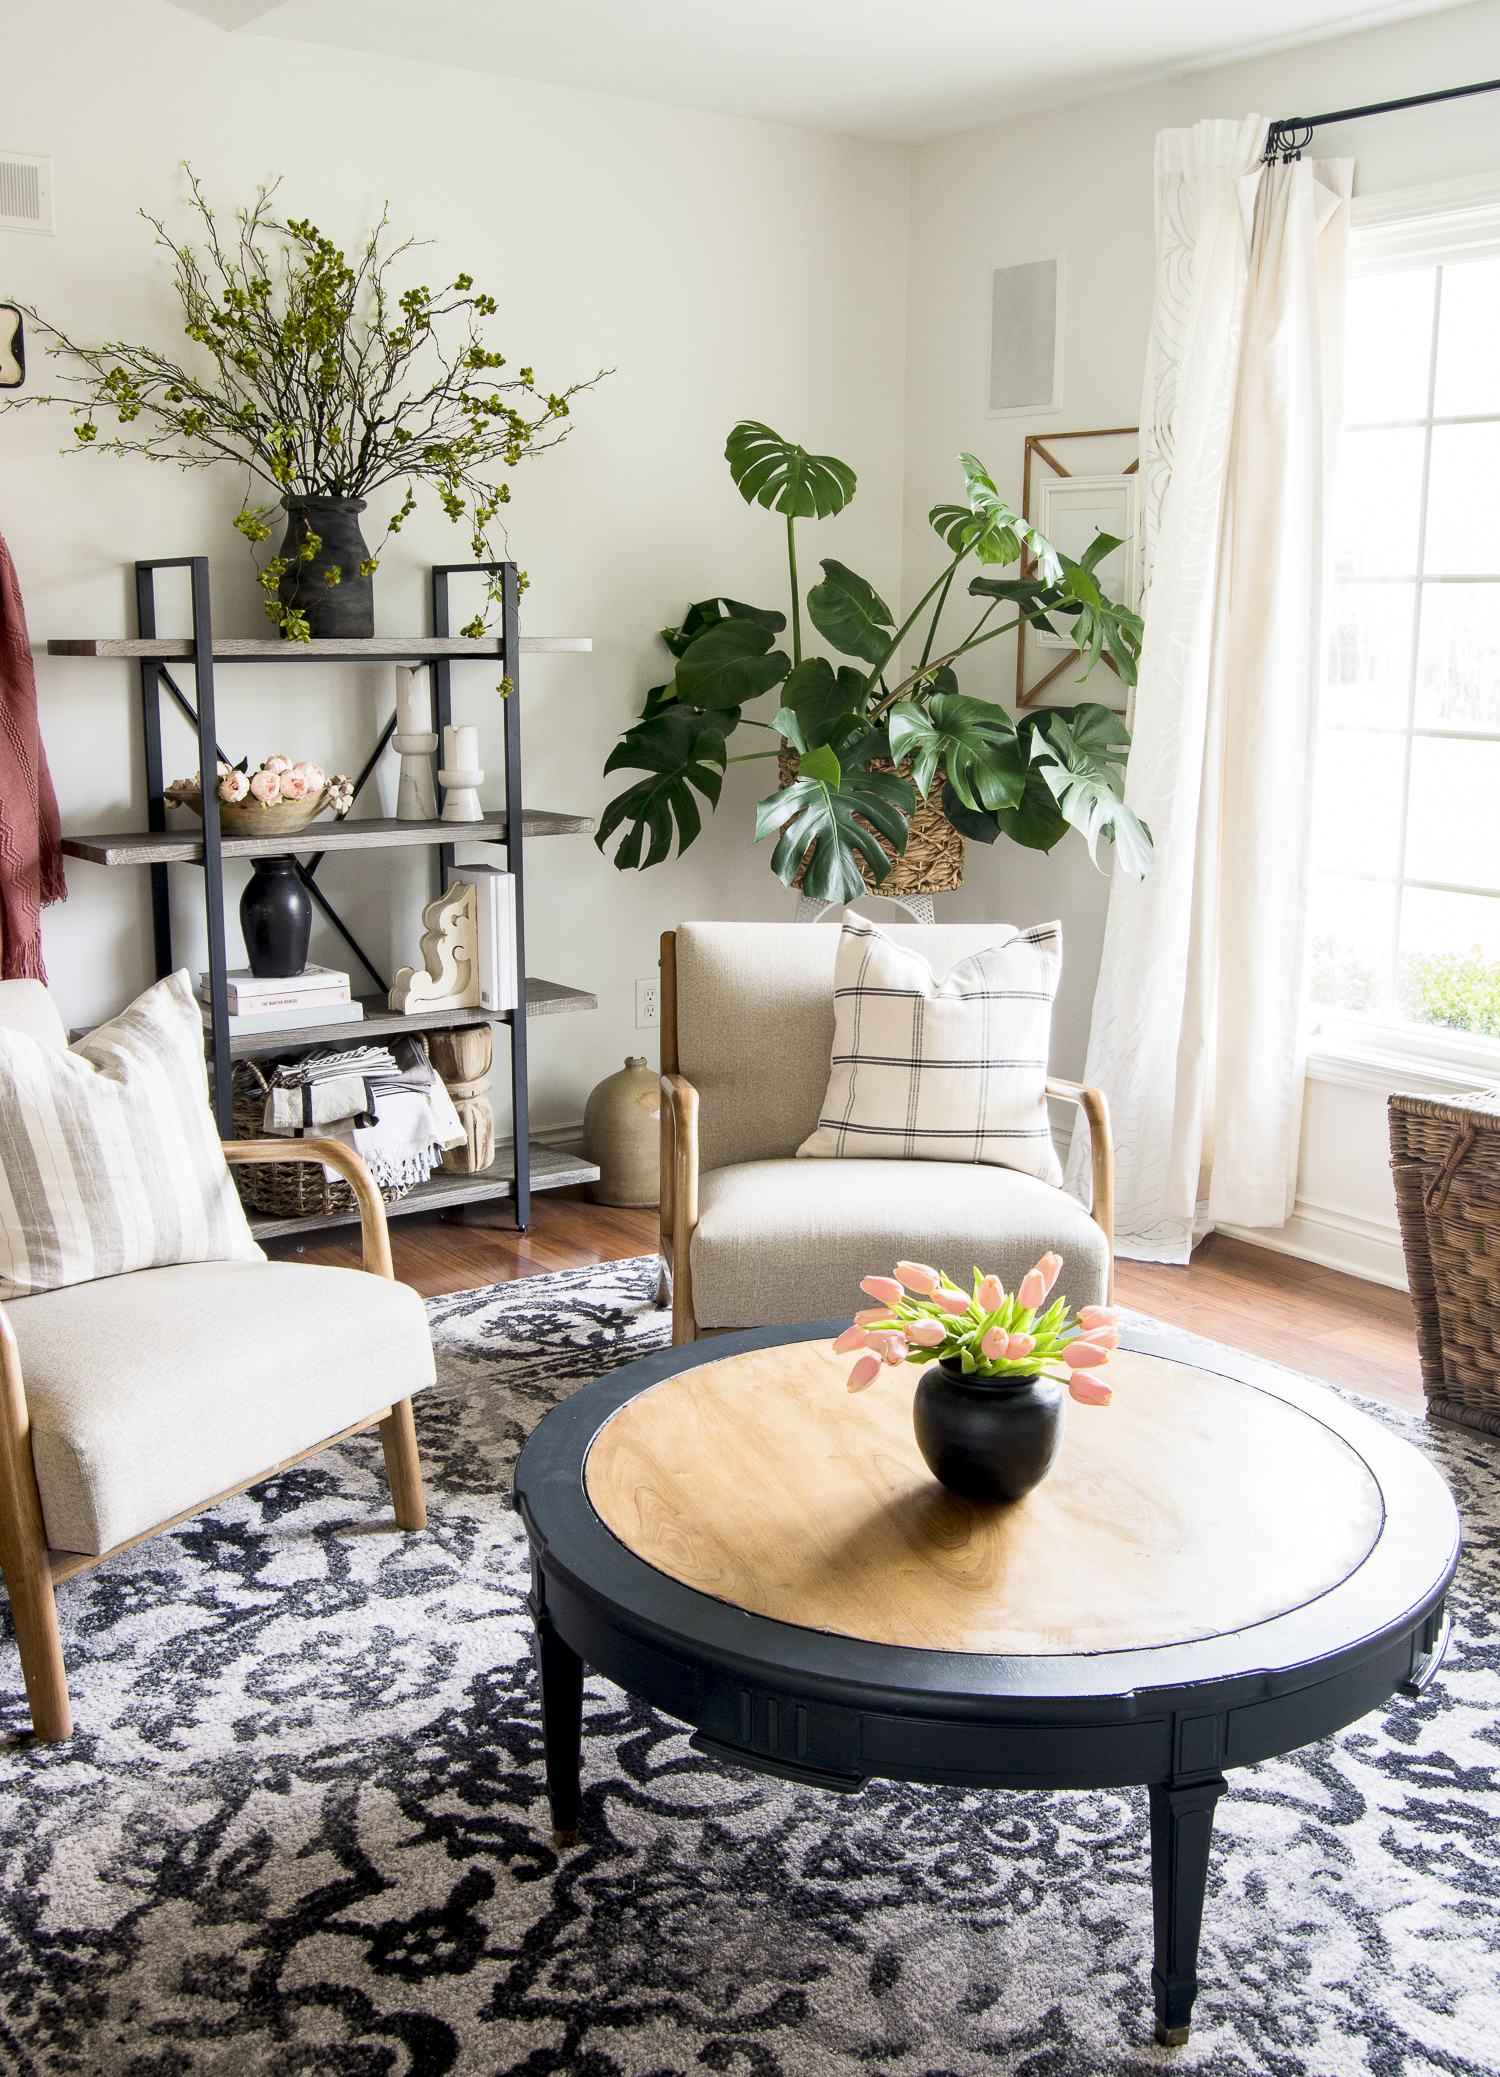 DIY furniture restoration project.